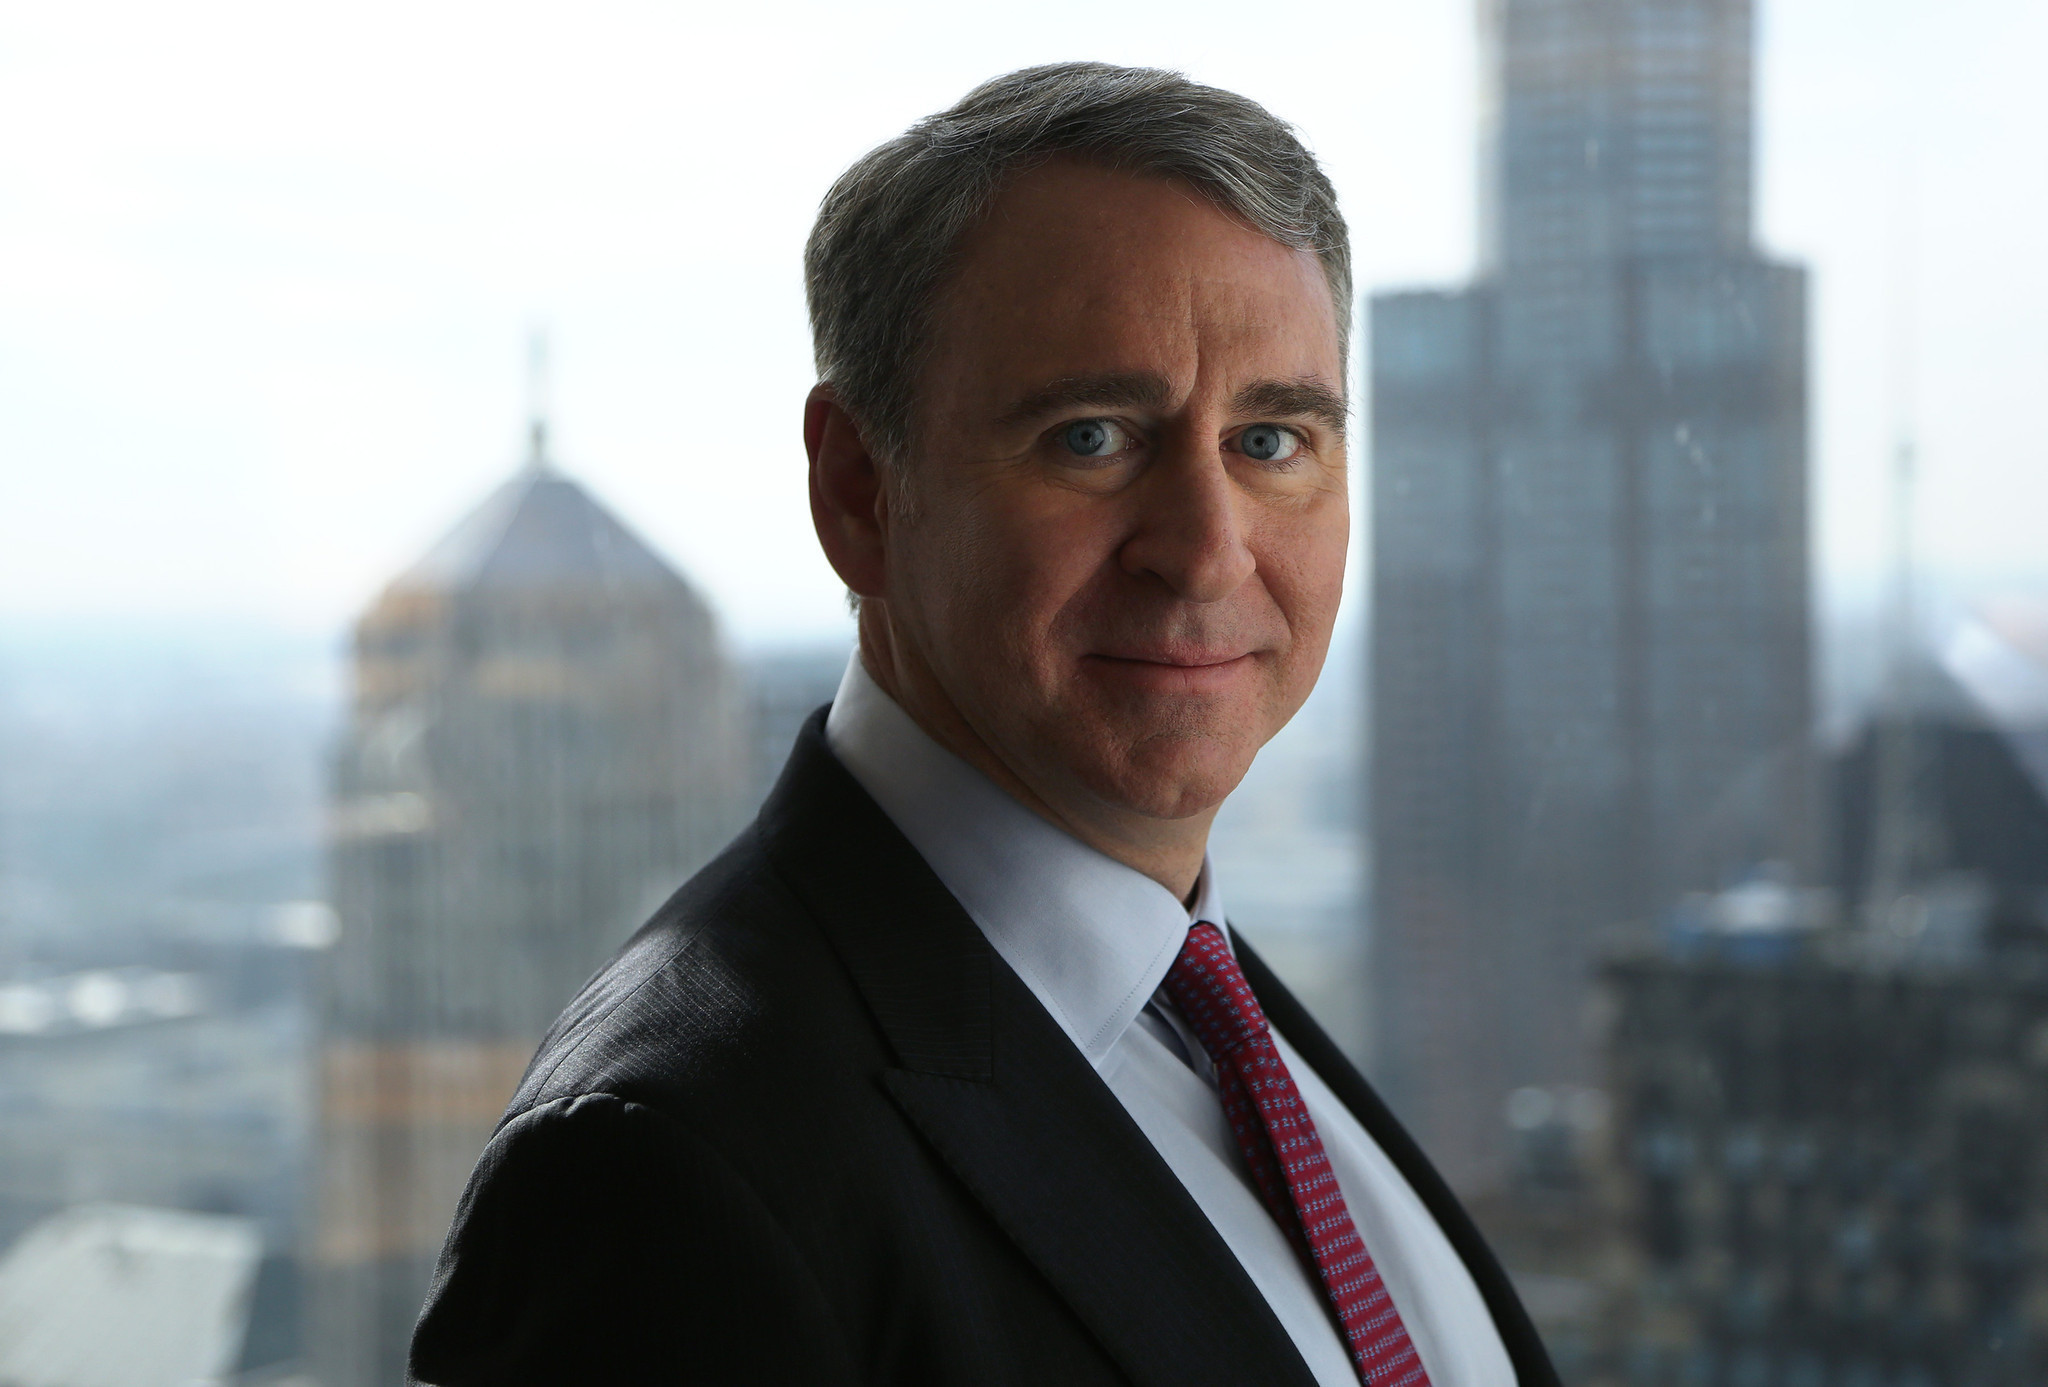 Ken Griffin spent $30M last year to buy 2 floors in Waldorf